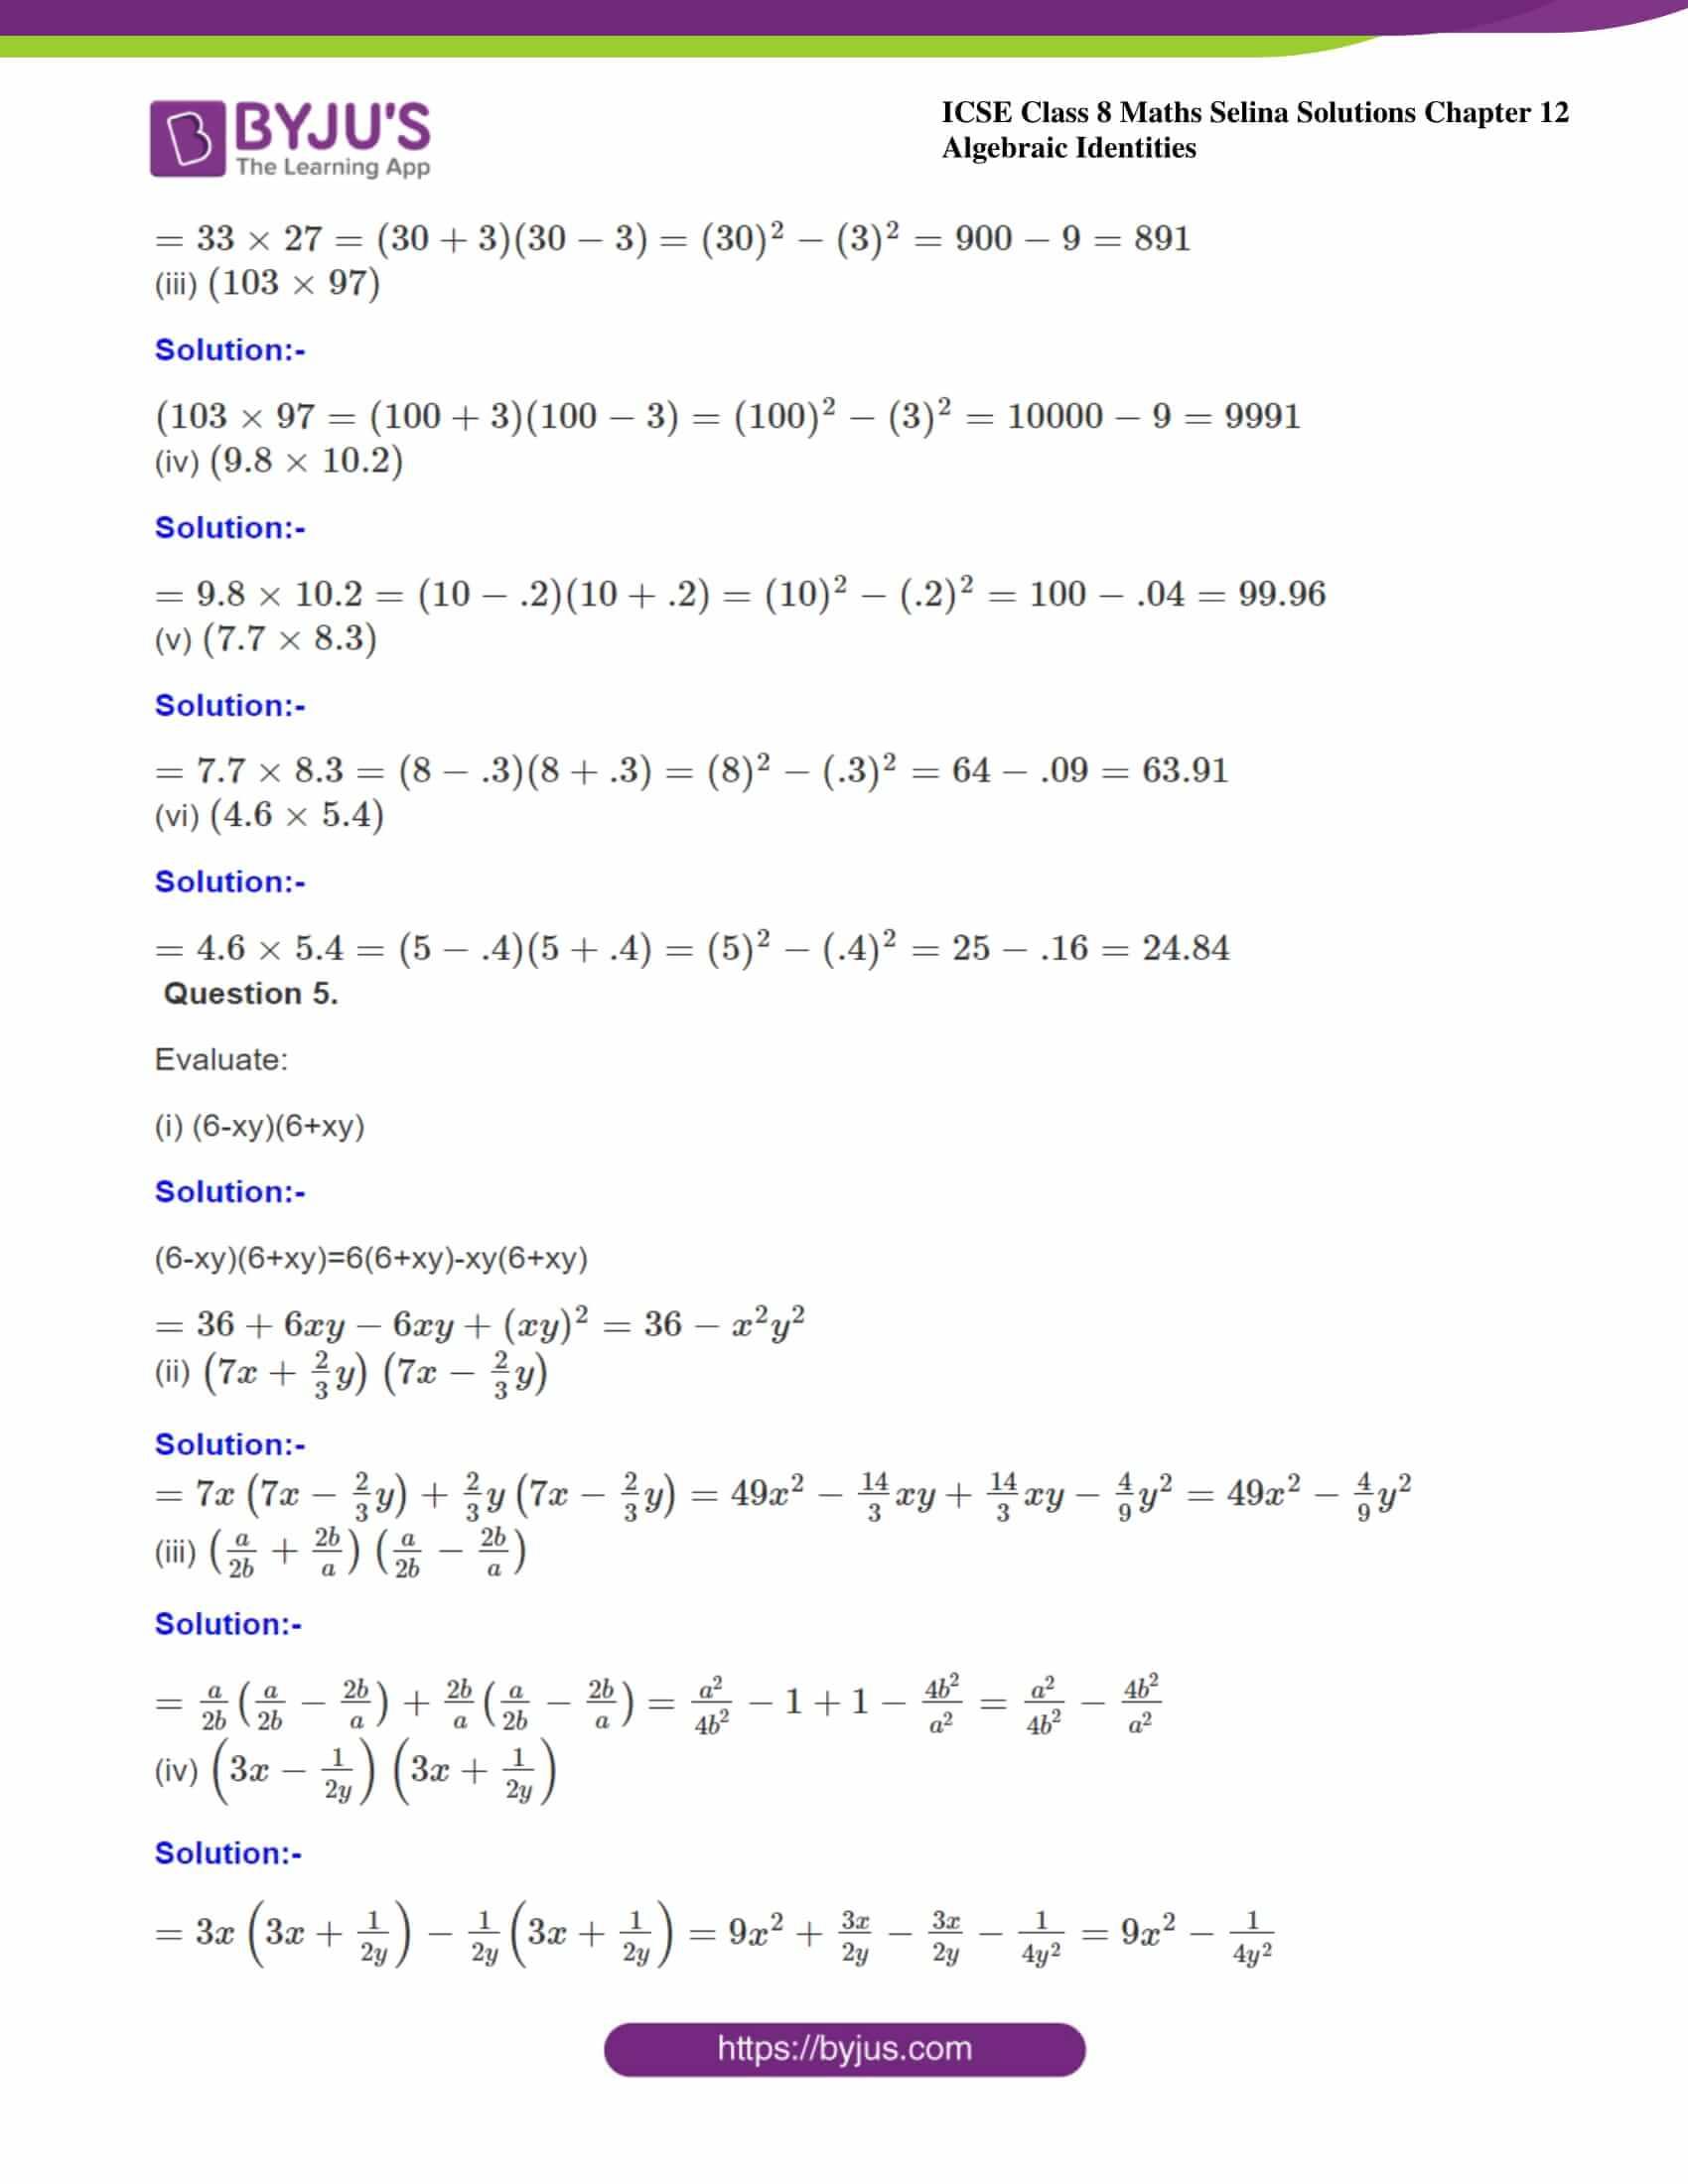 icse class 8 maths may3 selina solutions chapter 12 algebraic identities 04